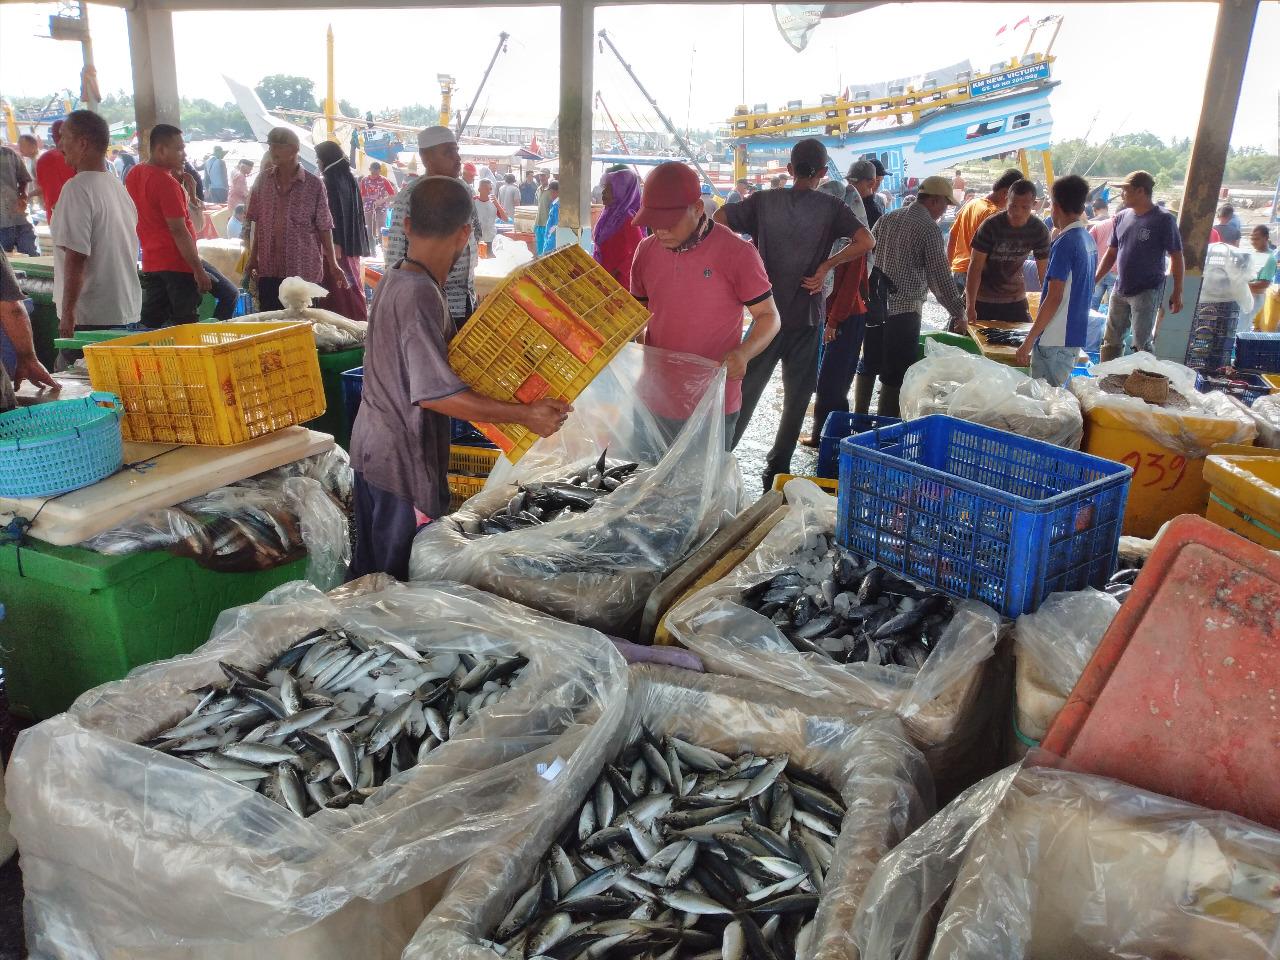 Hasil Tangkapan Nelayan Melimpah, Harga Ikan Laut Anjlok